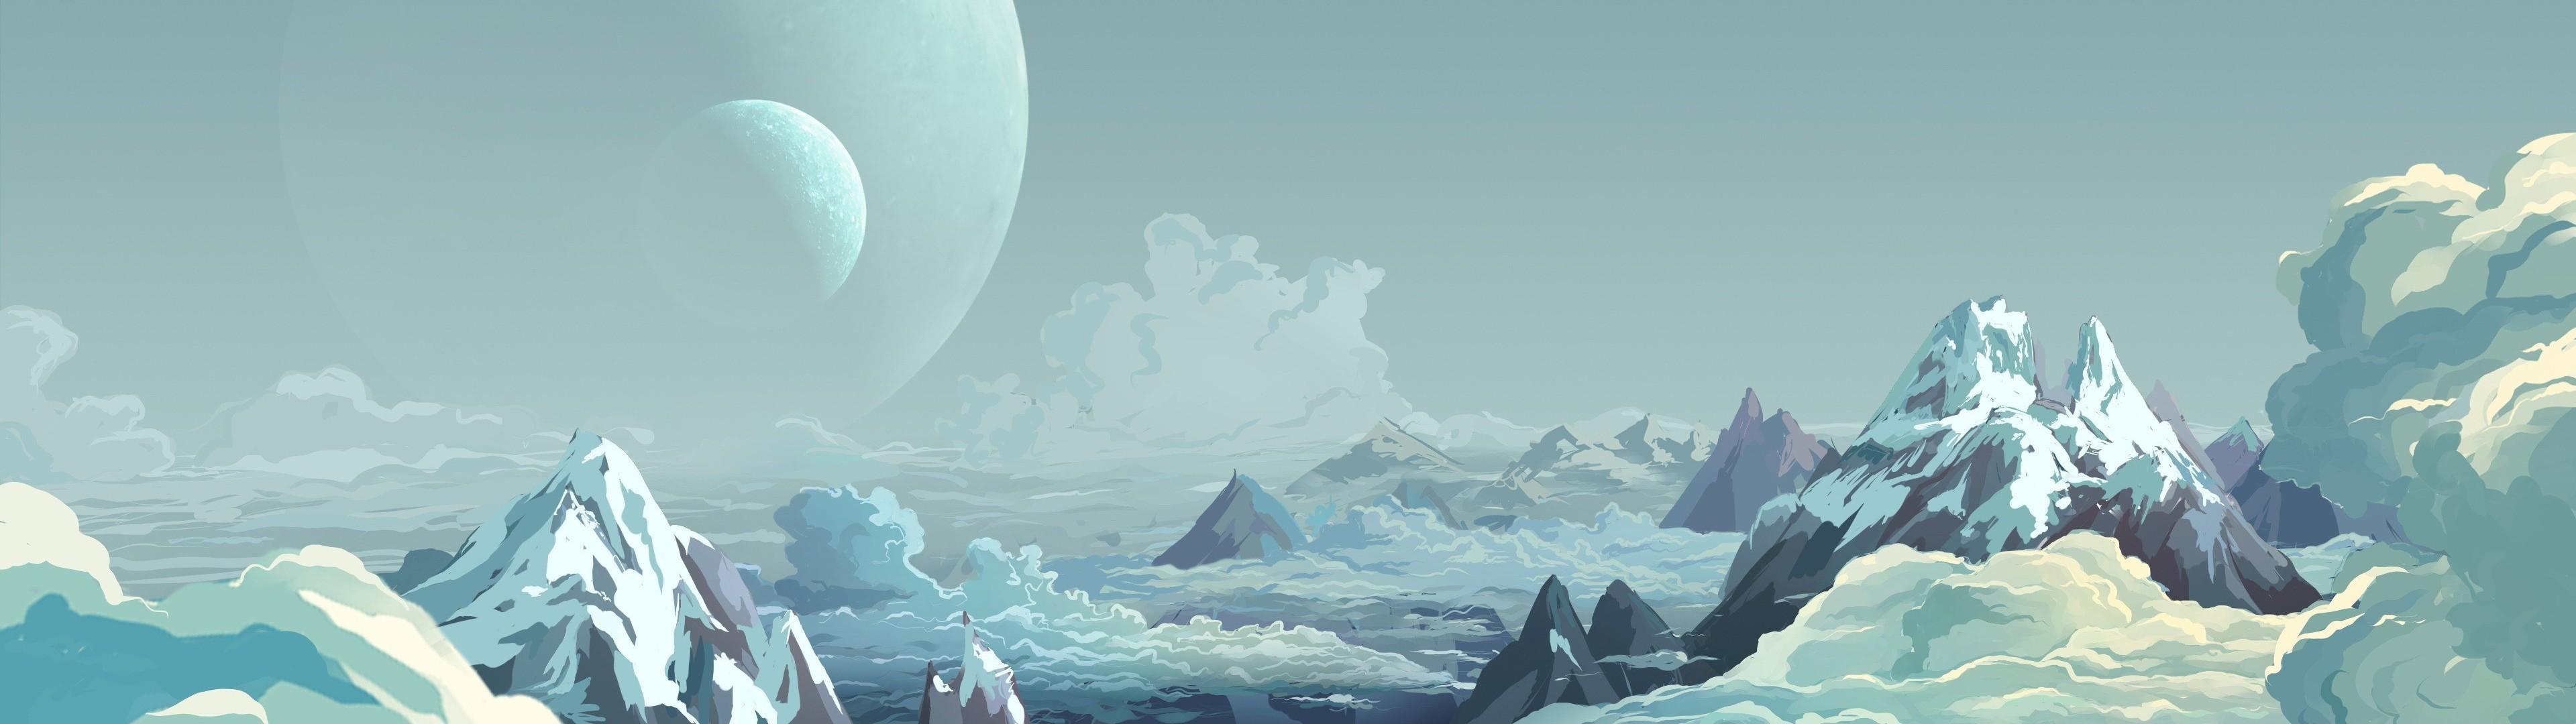 Wallpaper Japan Landscape Mountains Anime Nature Sky Snow